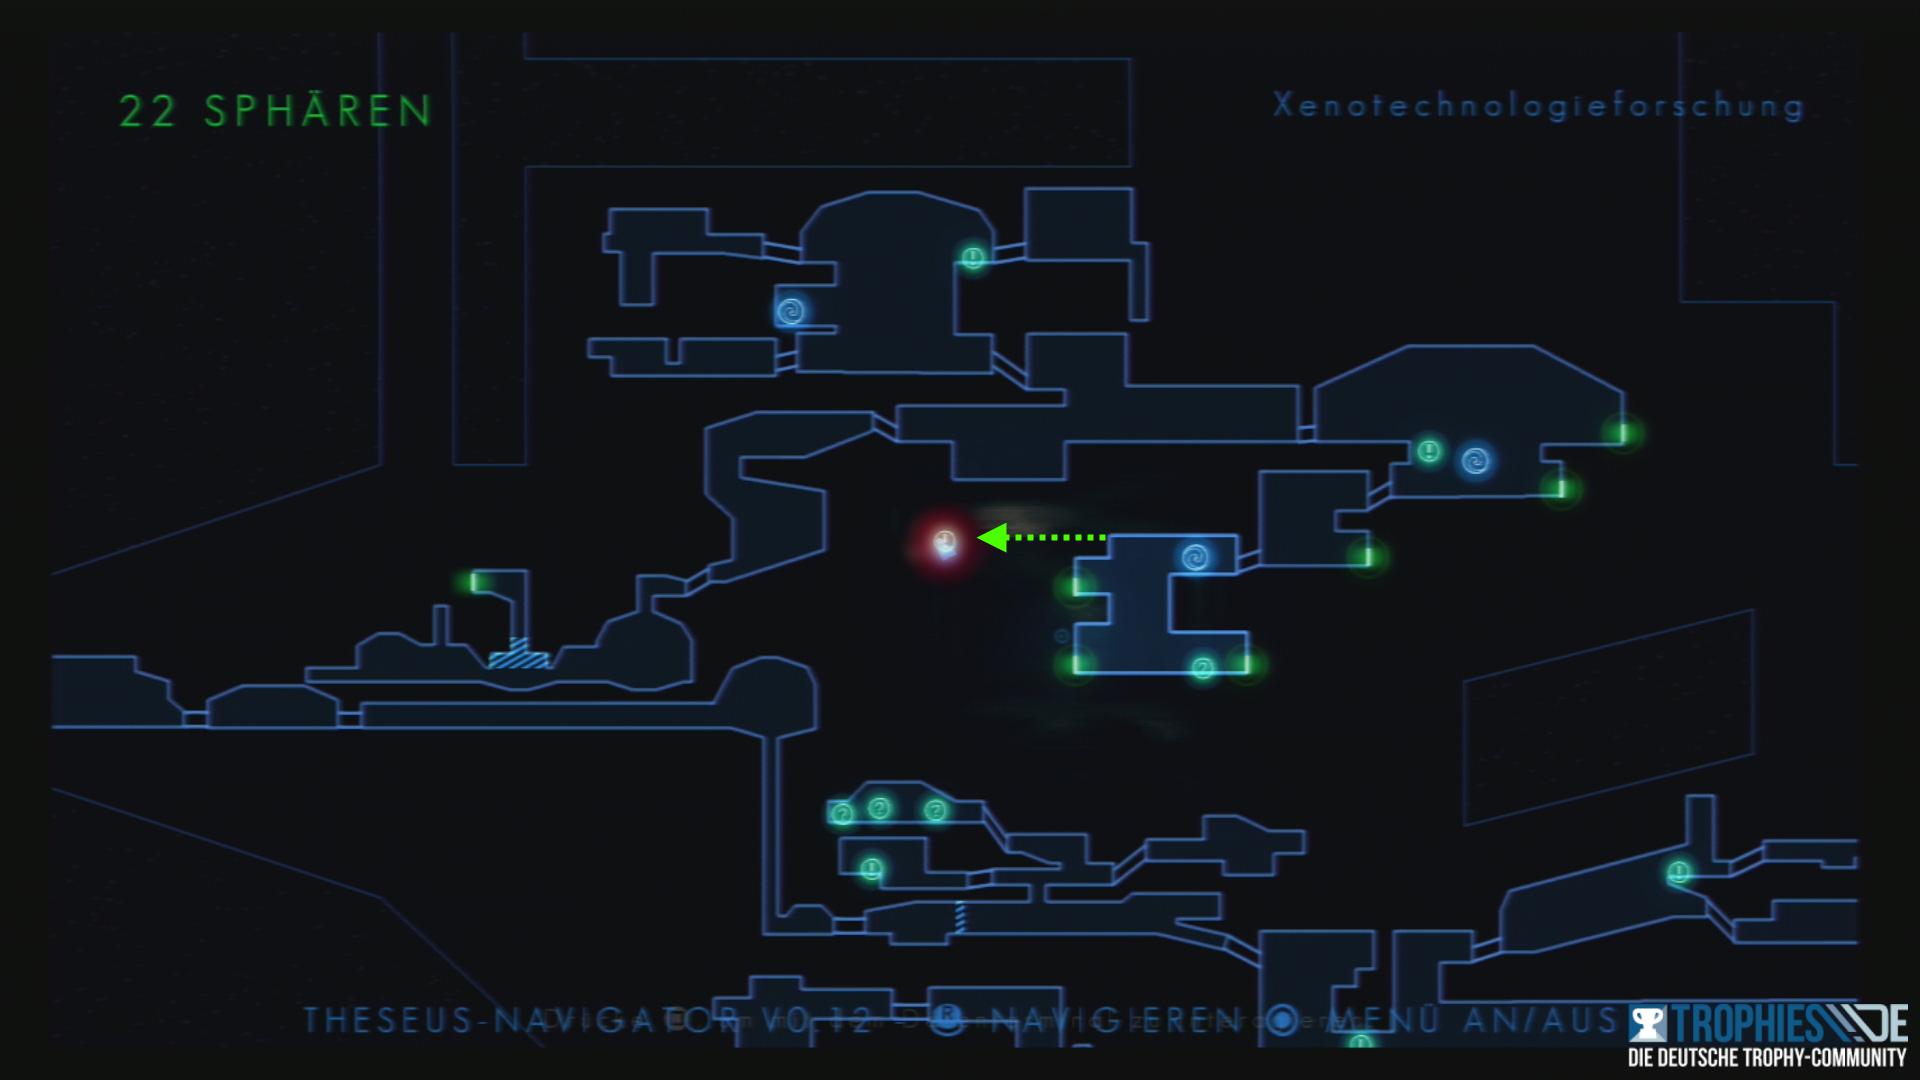 fundort-geheimraum-5.png